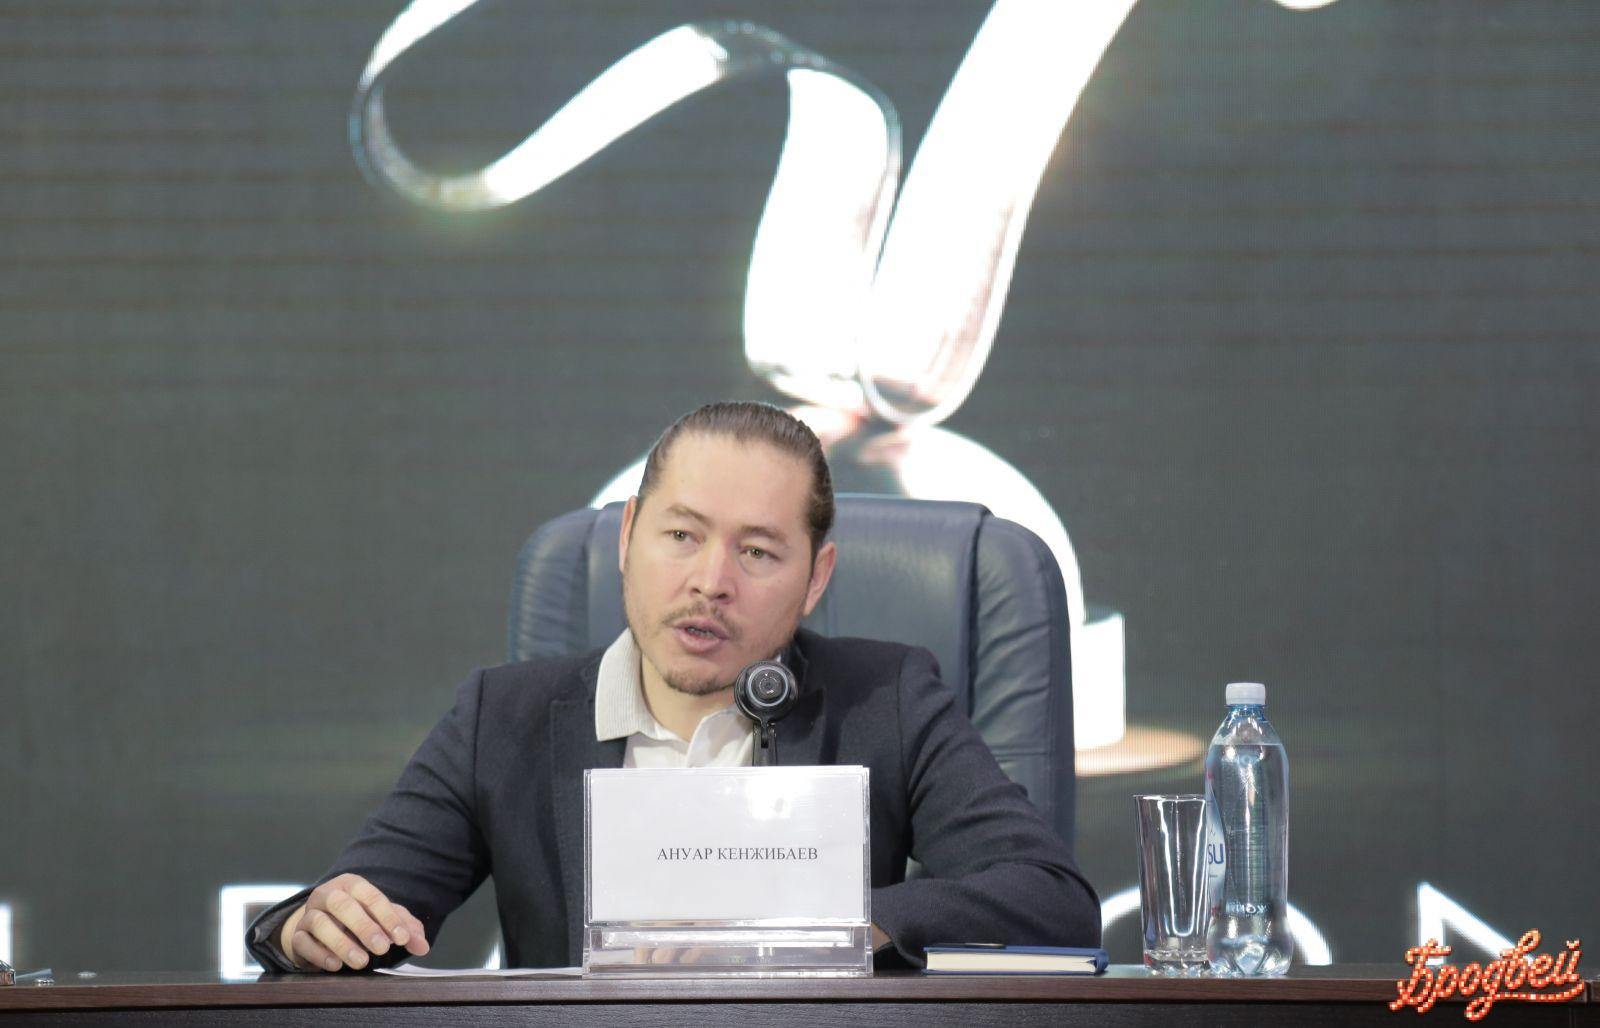 Директор фестиваля Ануар Кенжибаев